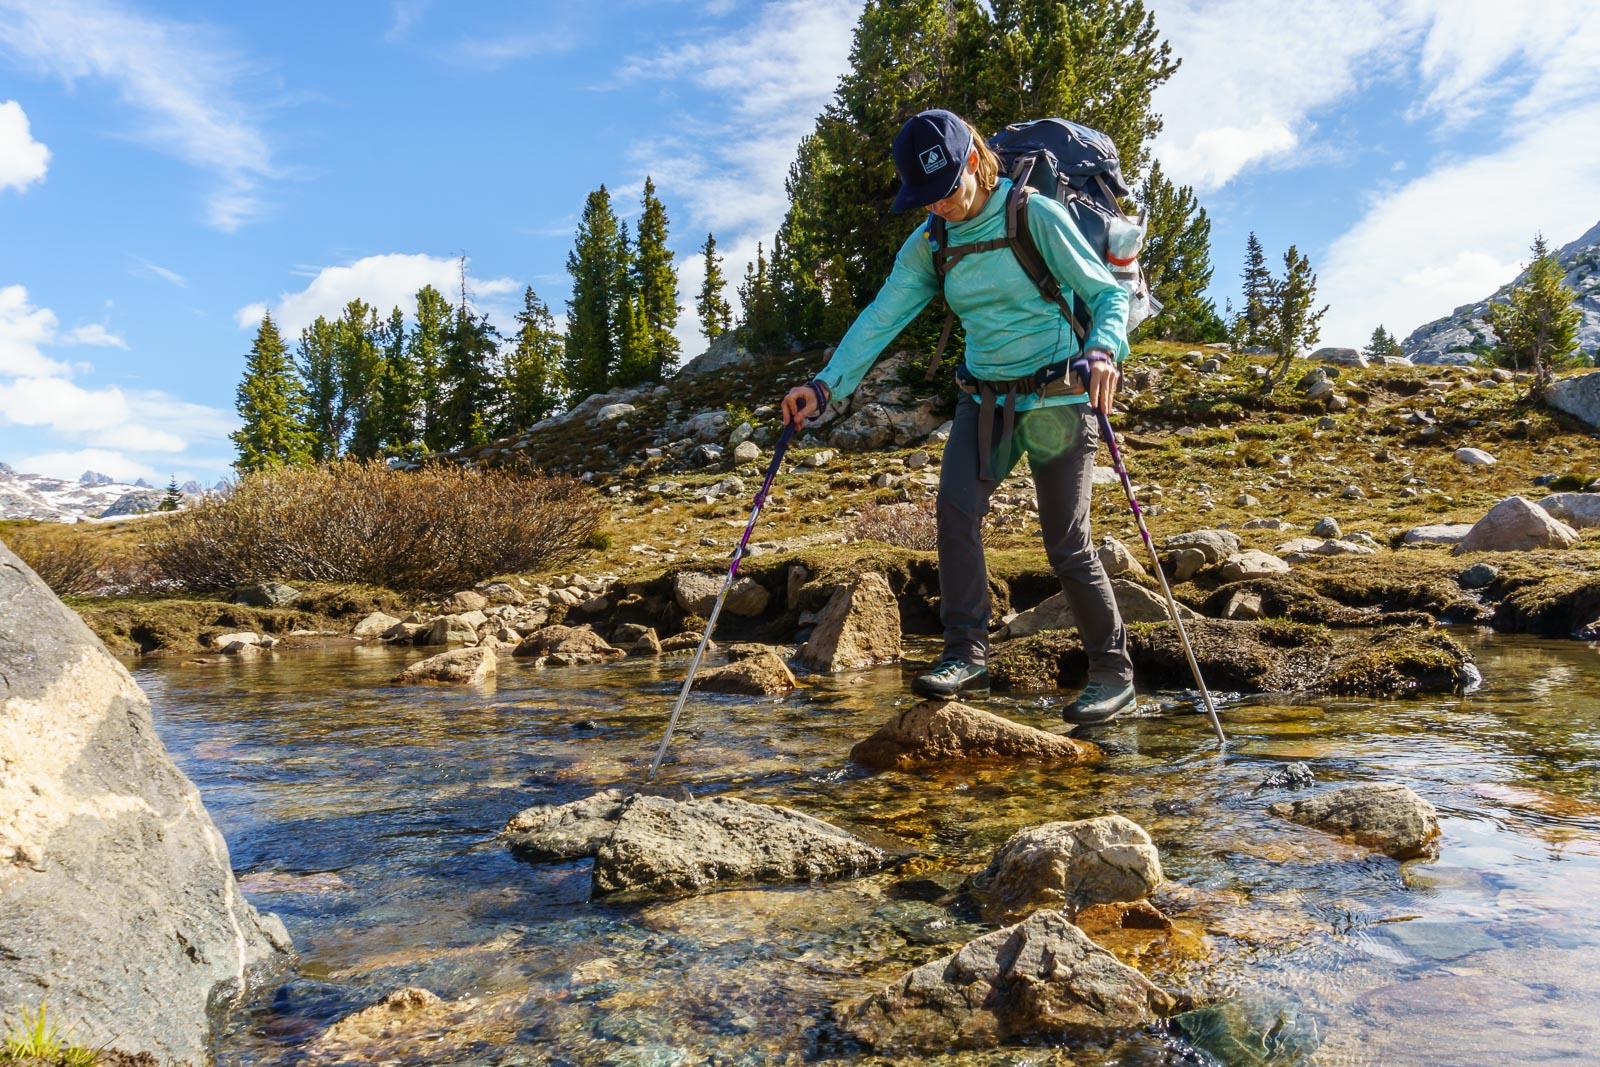 One of many stream crossings.